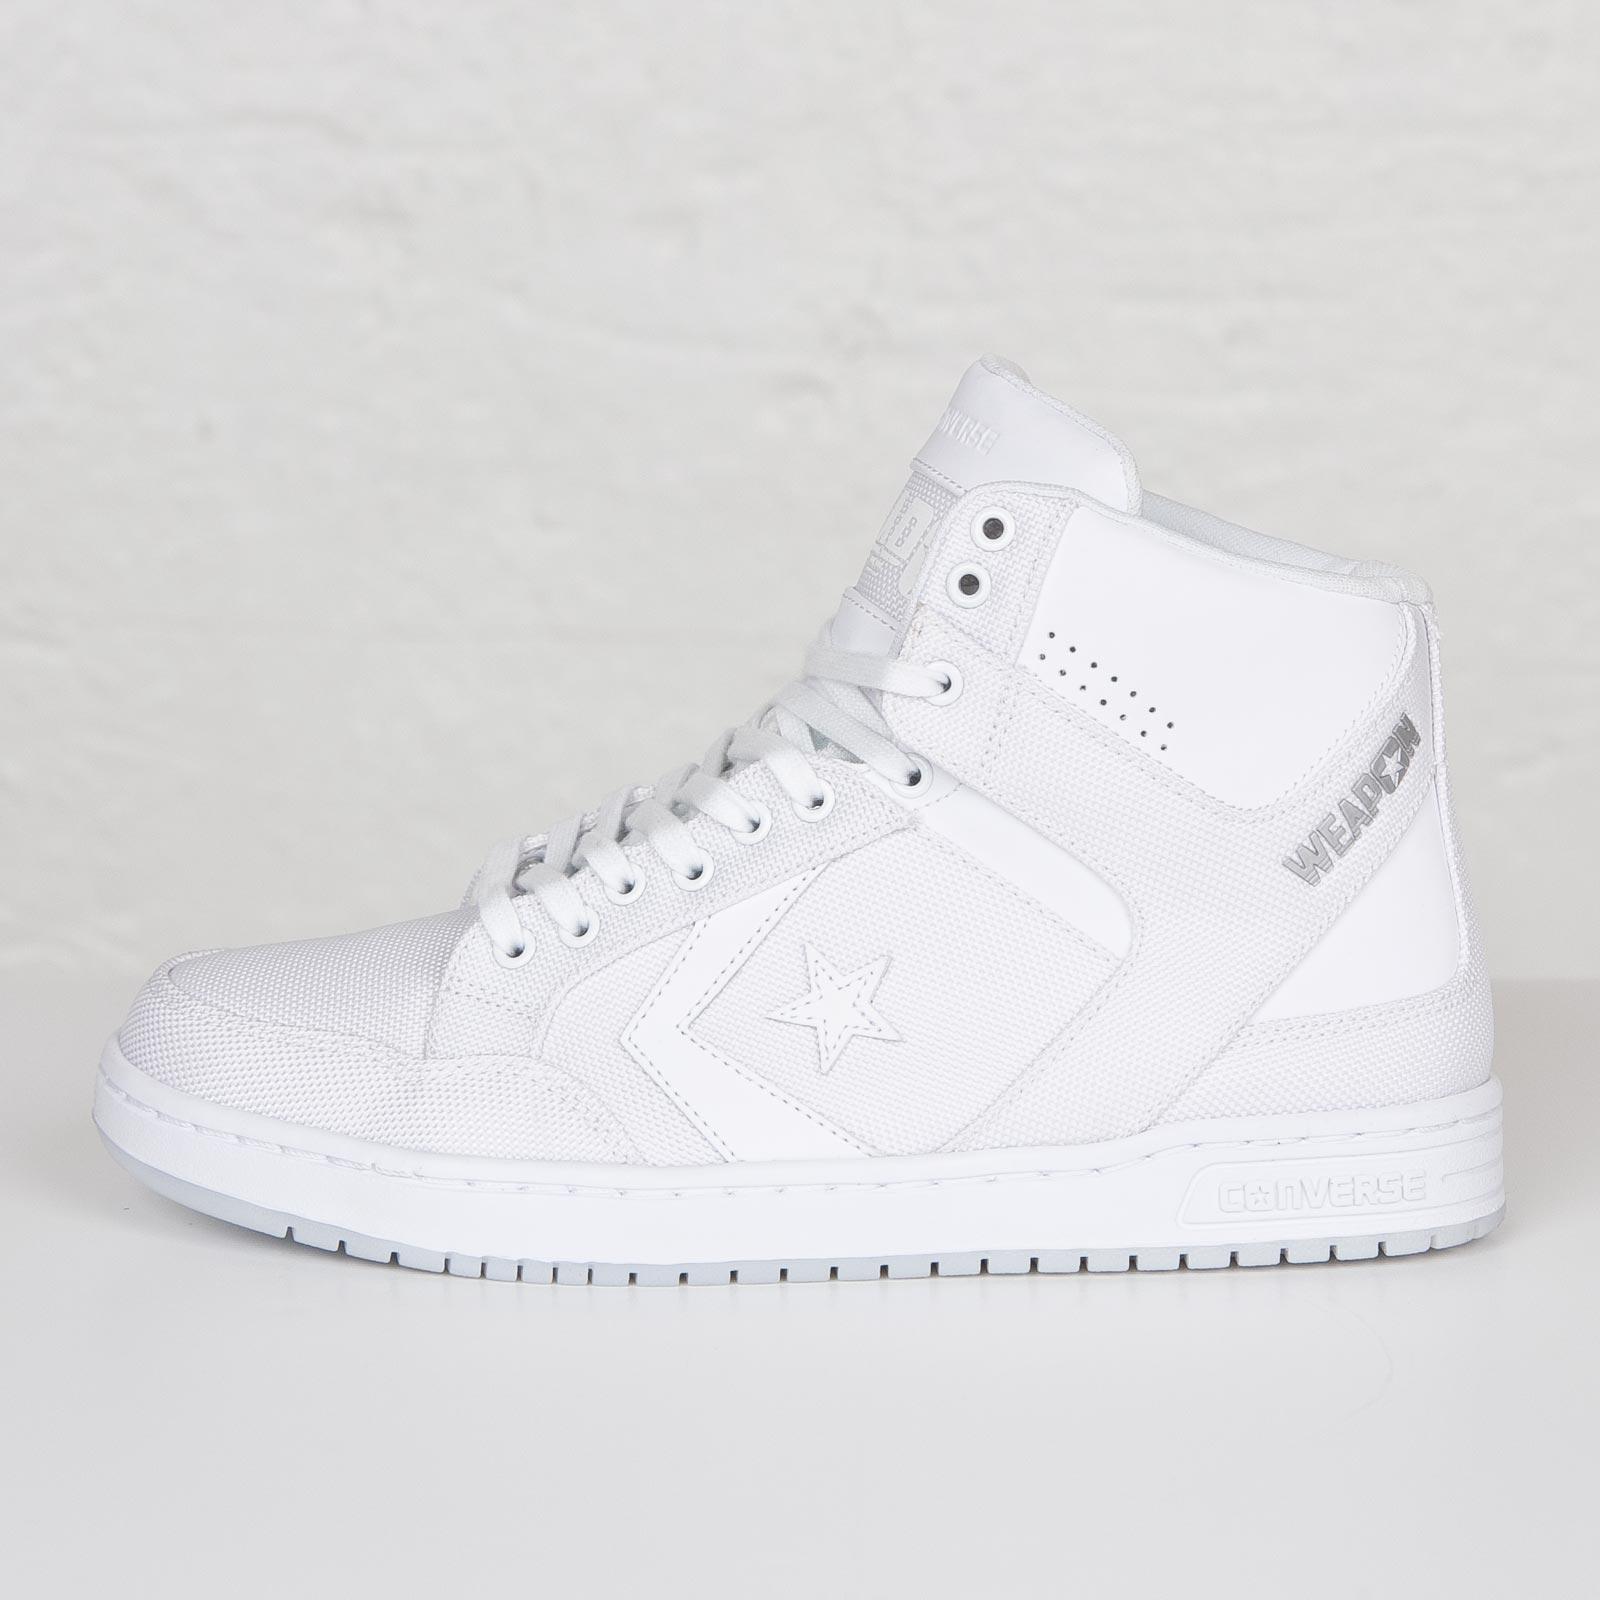 Converse Weapon mid - 147472c - Sneakersnstuff | sneakers ...